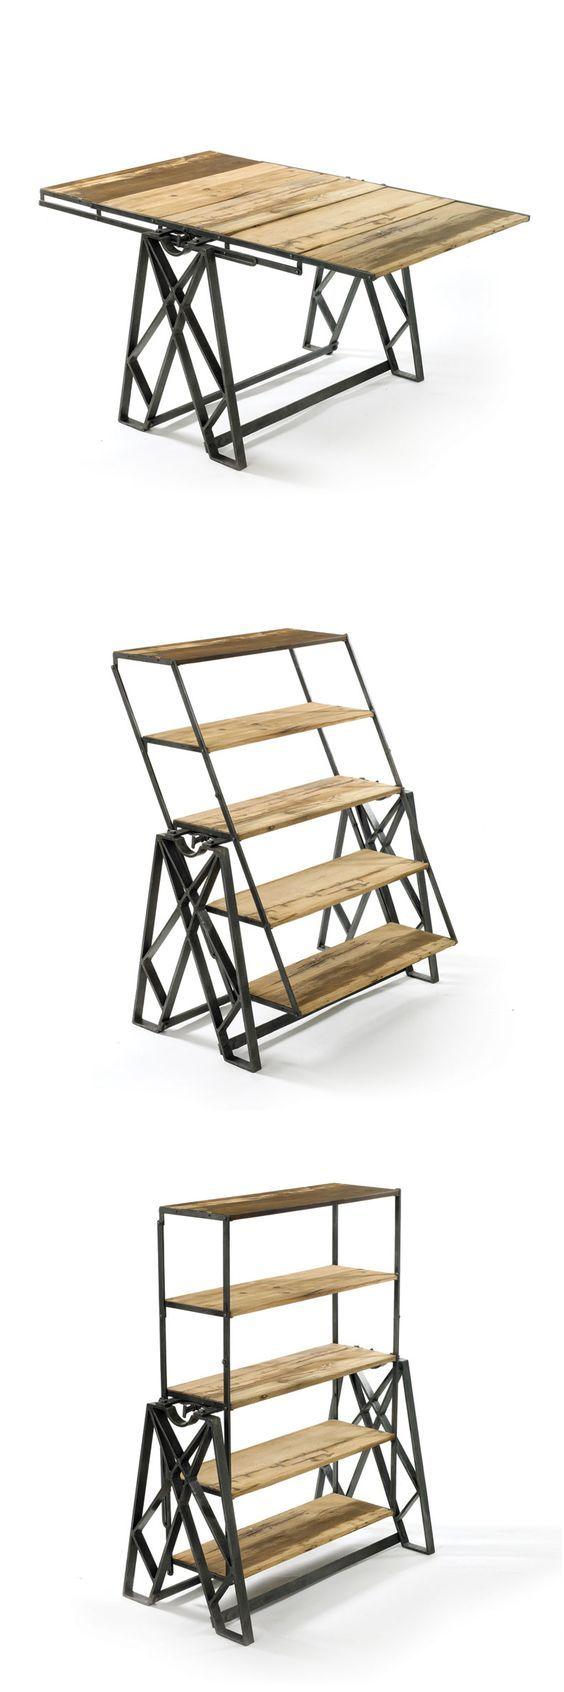 Shelves Fold Down To Table Furniture Furniture Design Interior